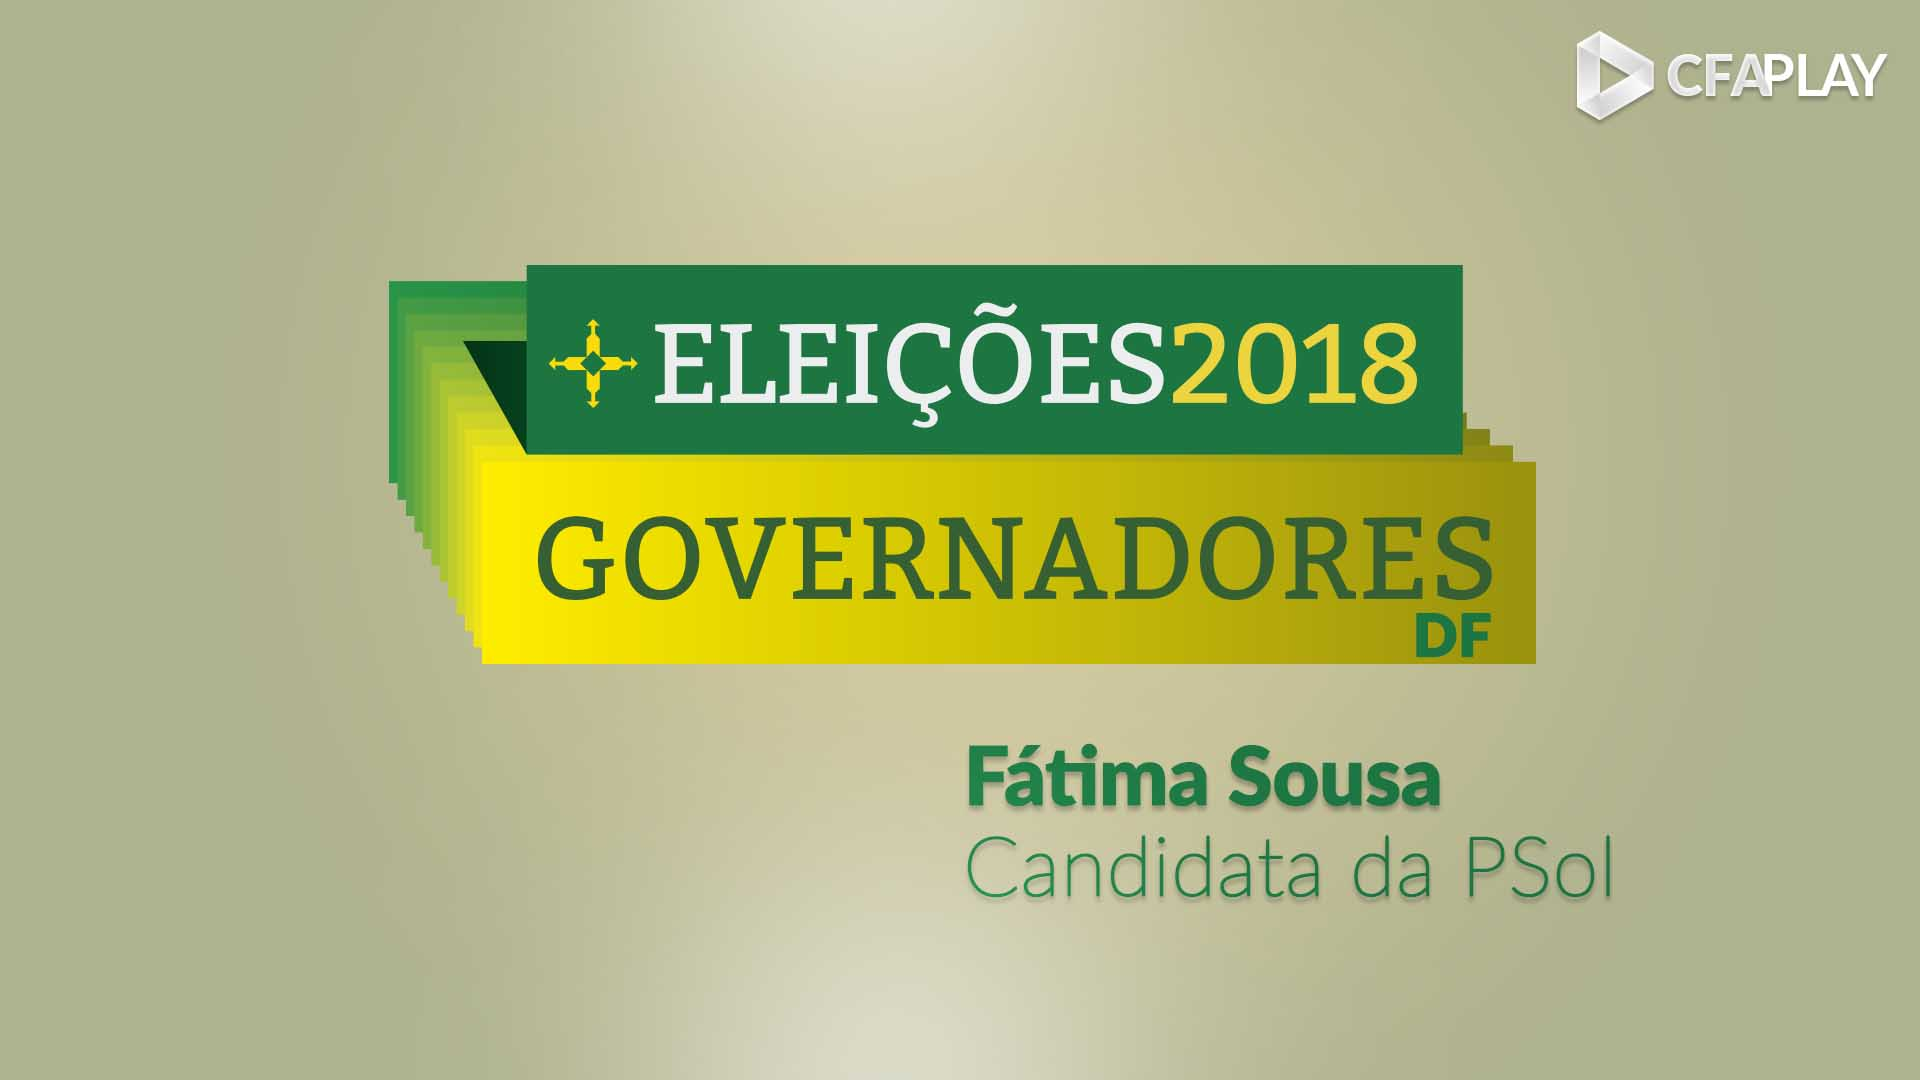 Governadores GDF 2018: Análise do candidato Fátima Sousa (PSol)